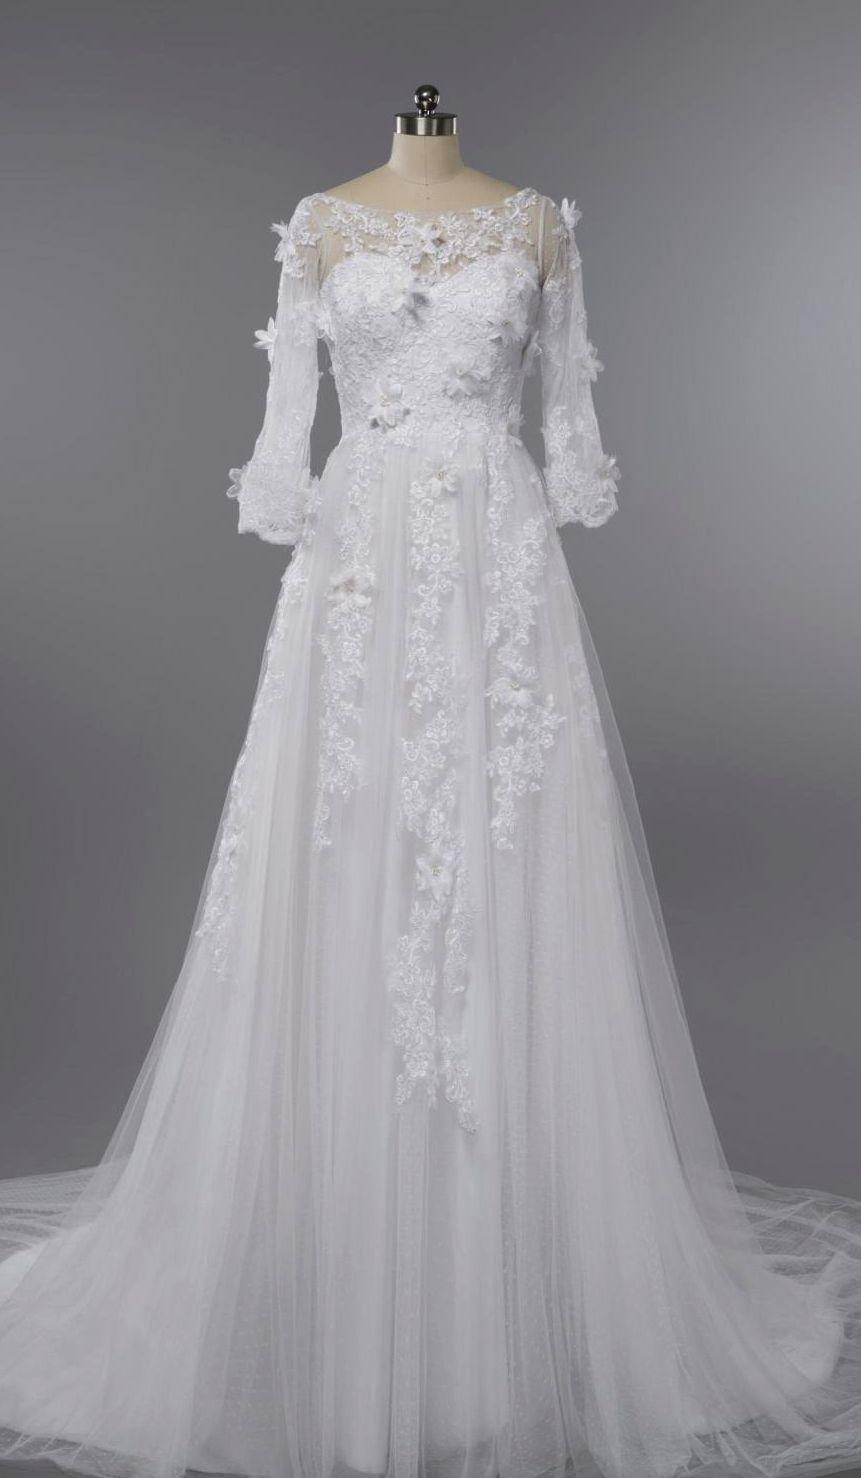 Half sleeve long lace wedding dressthree quaters sleeves wedding